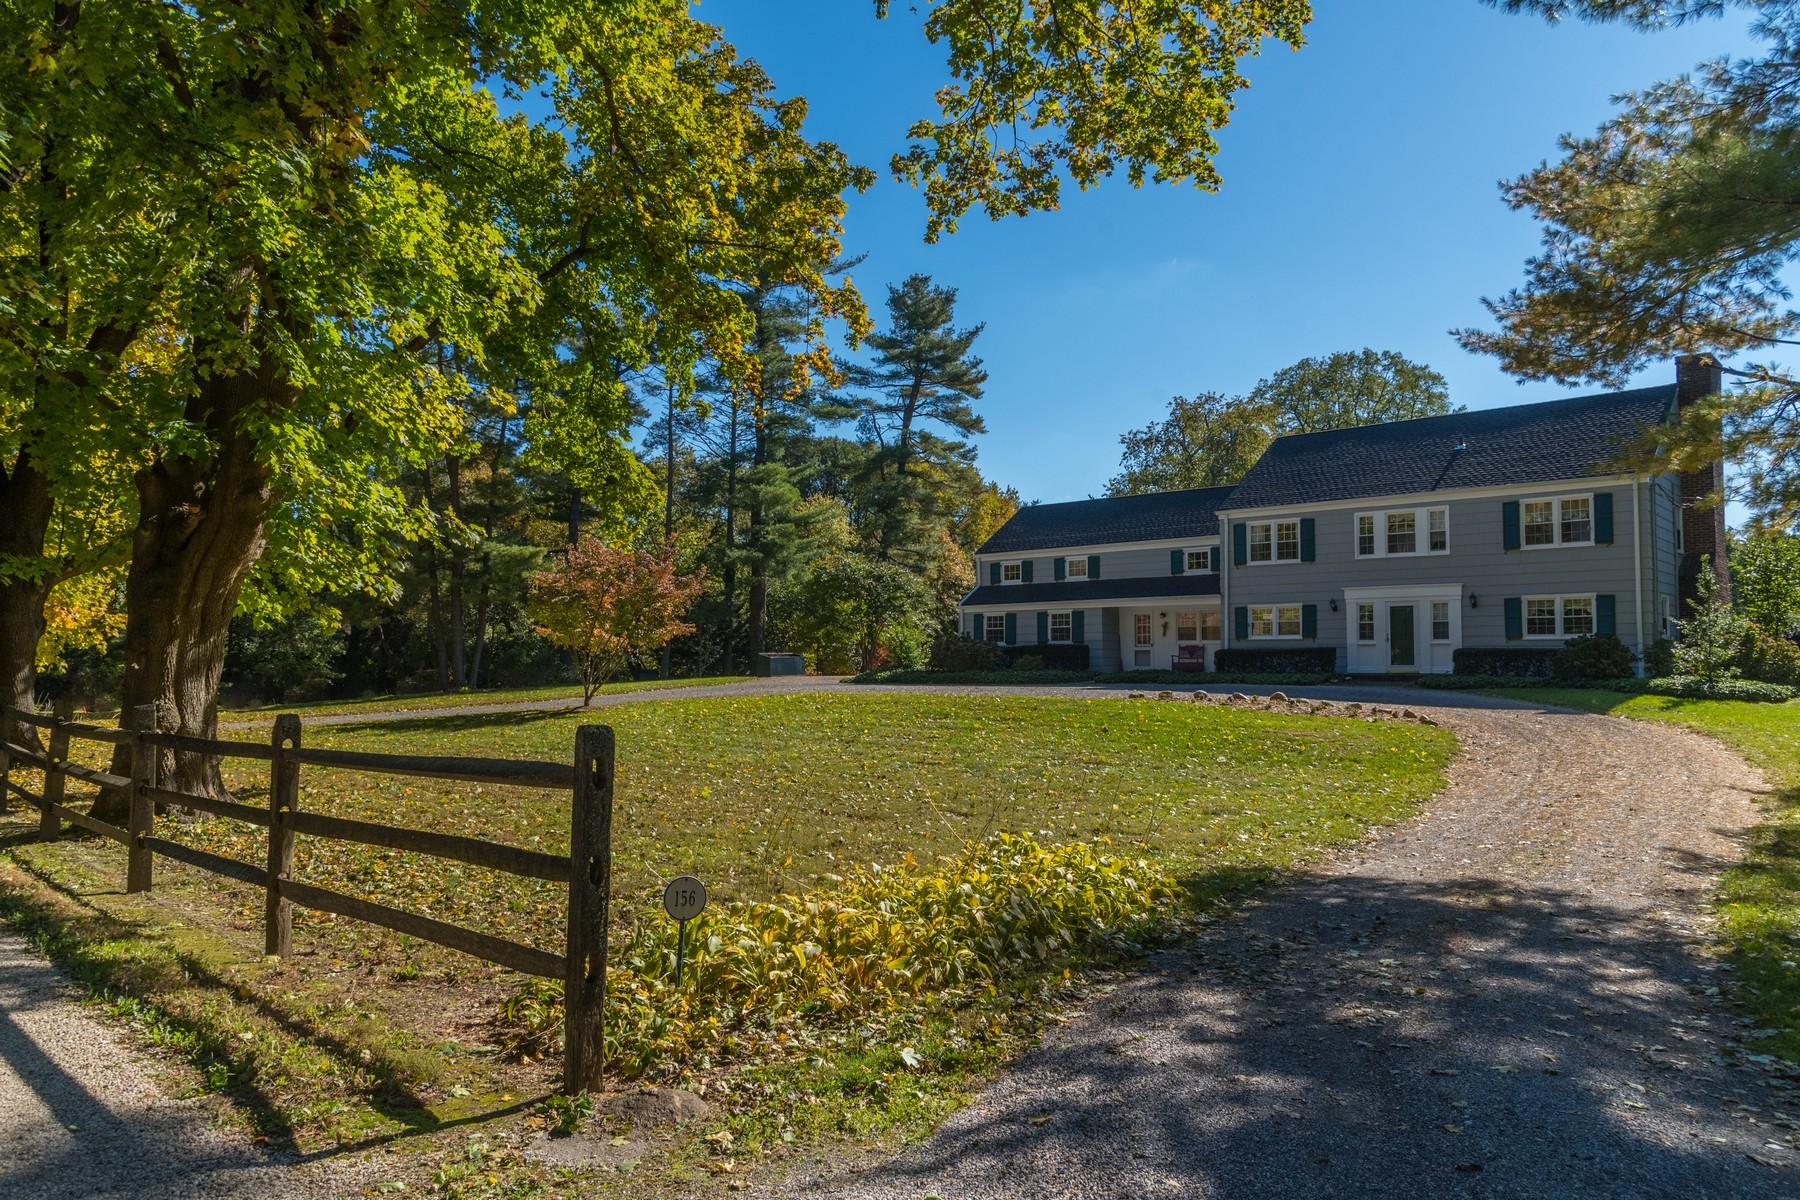 Single Family Homes for Sale at Old Brookville 156 Hegemans Ln Old Brookville, New York 11545 United States